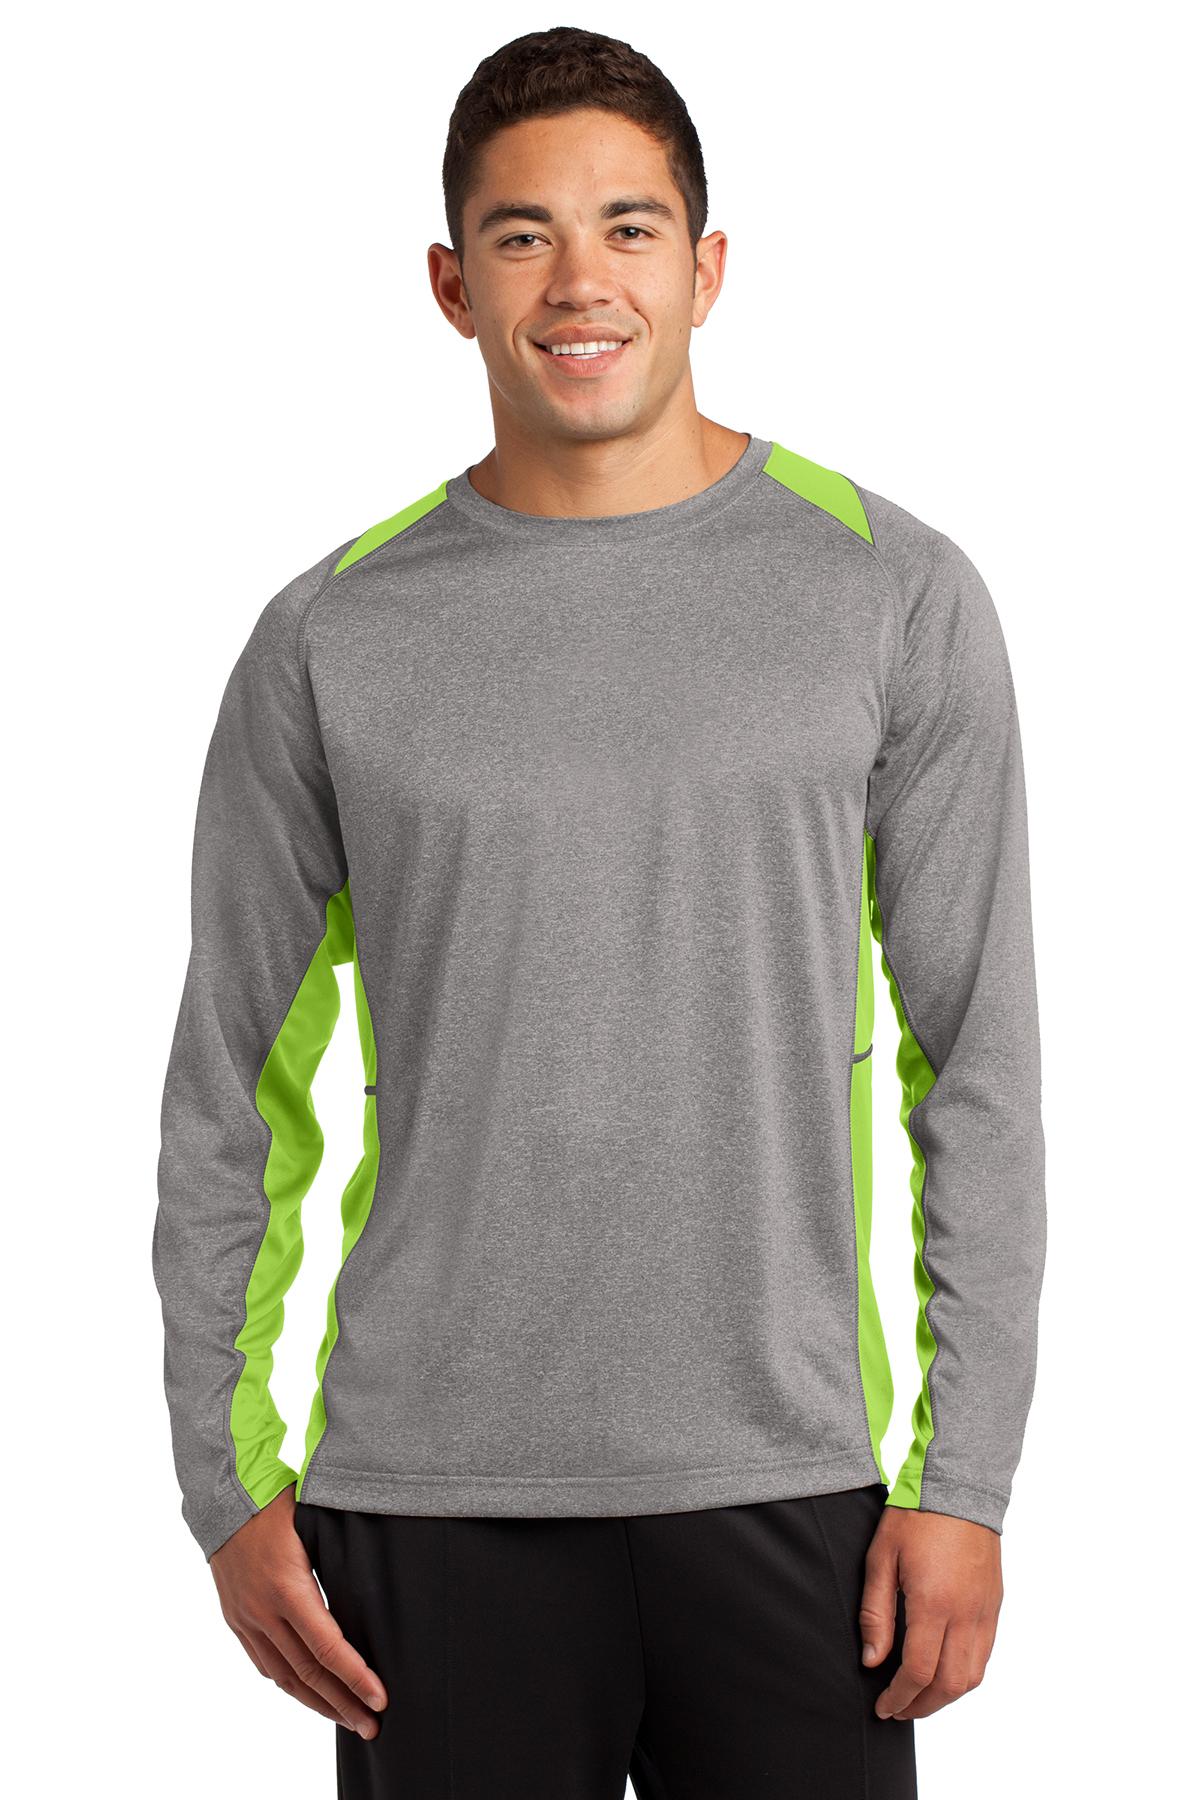 418458b5 Sport-Tek® Long Sleeve Heather Colorblock Contender™ Tee ...